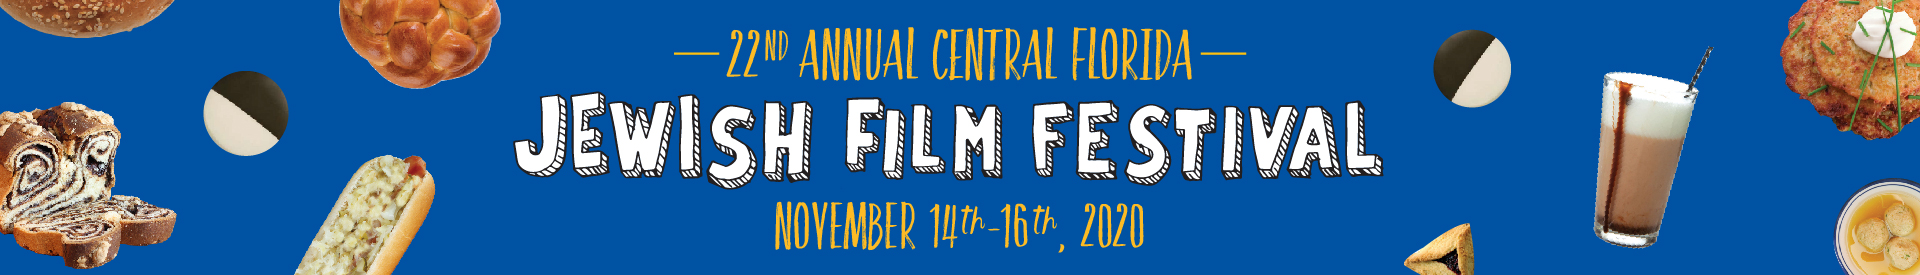 Central Florida Jewish Film Festival - 2020